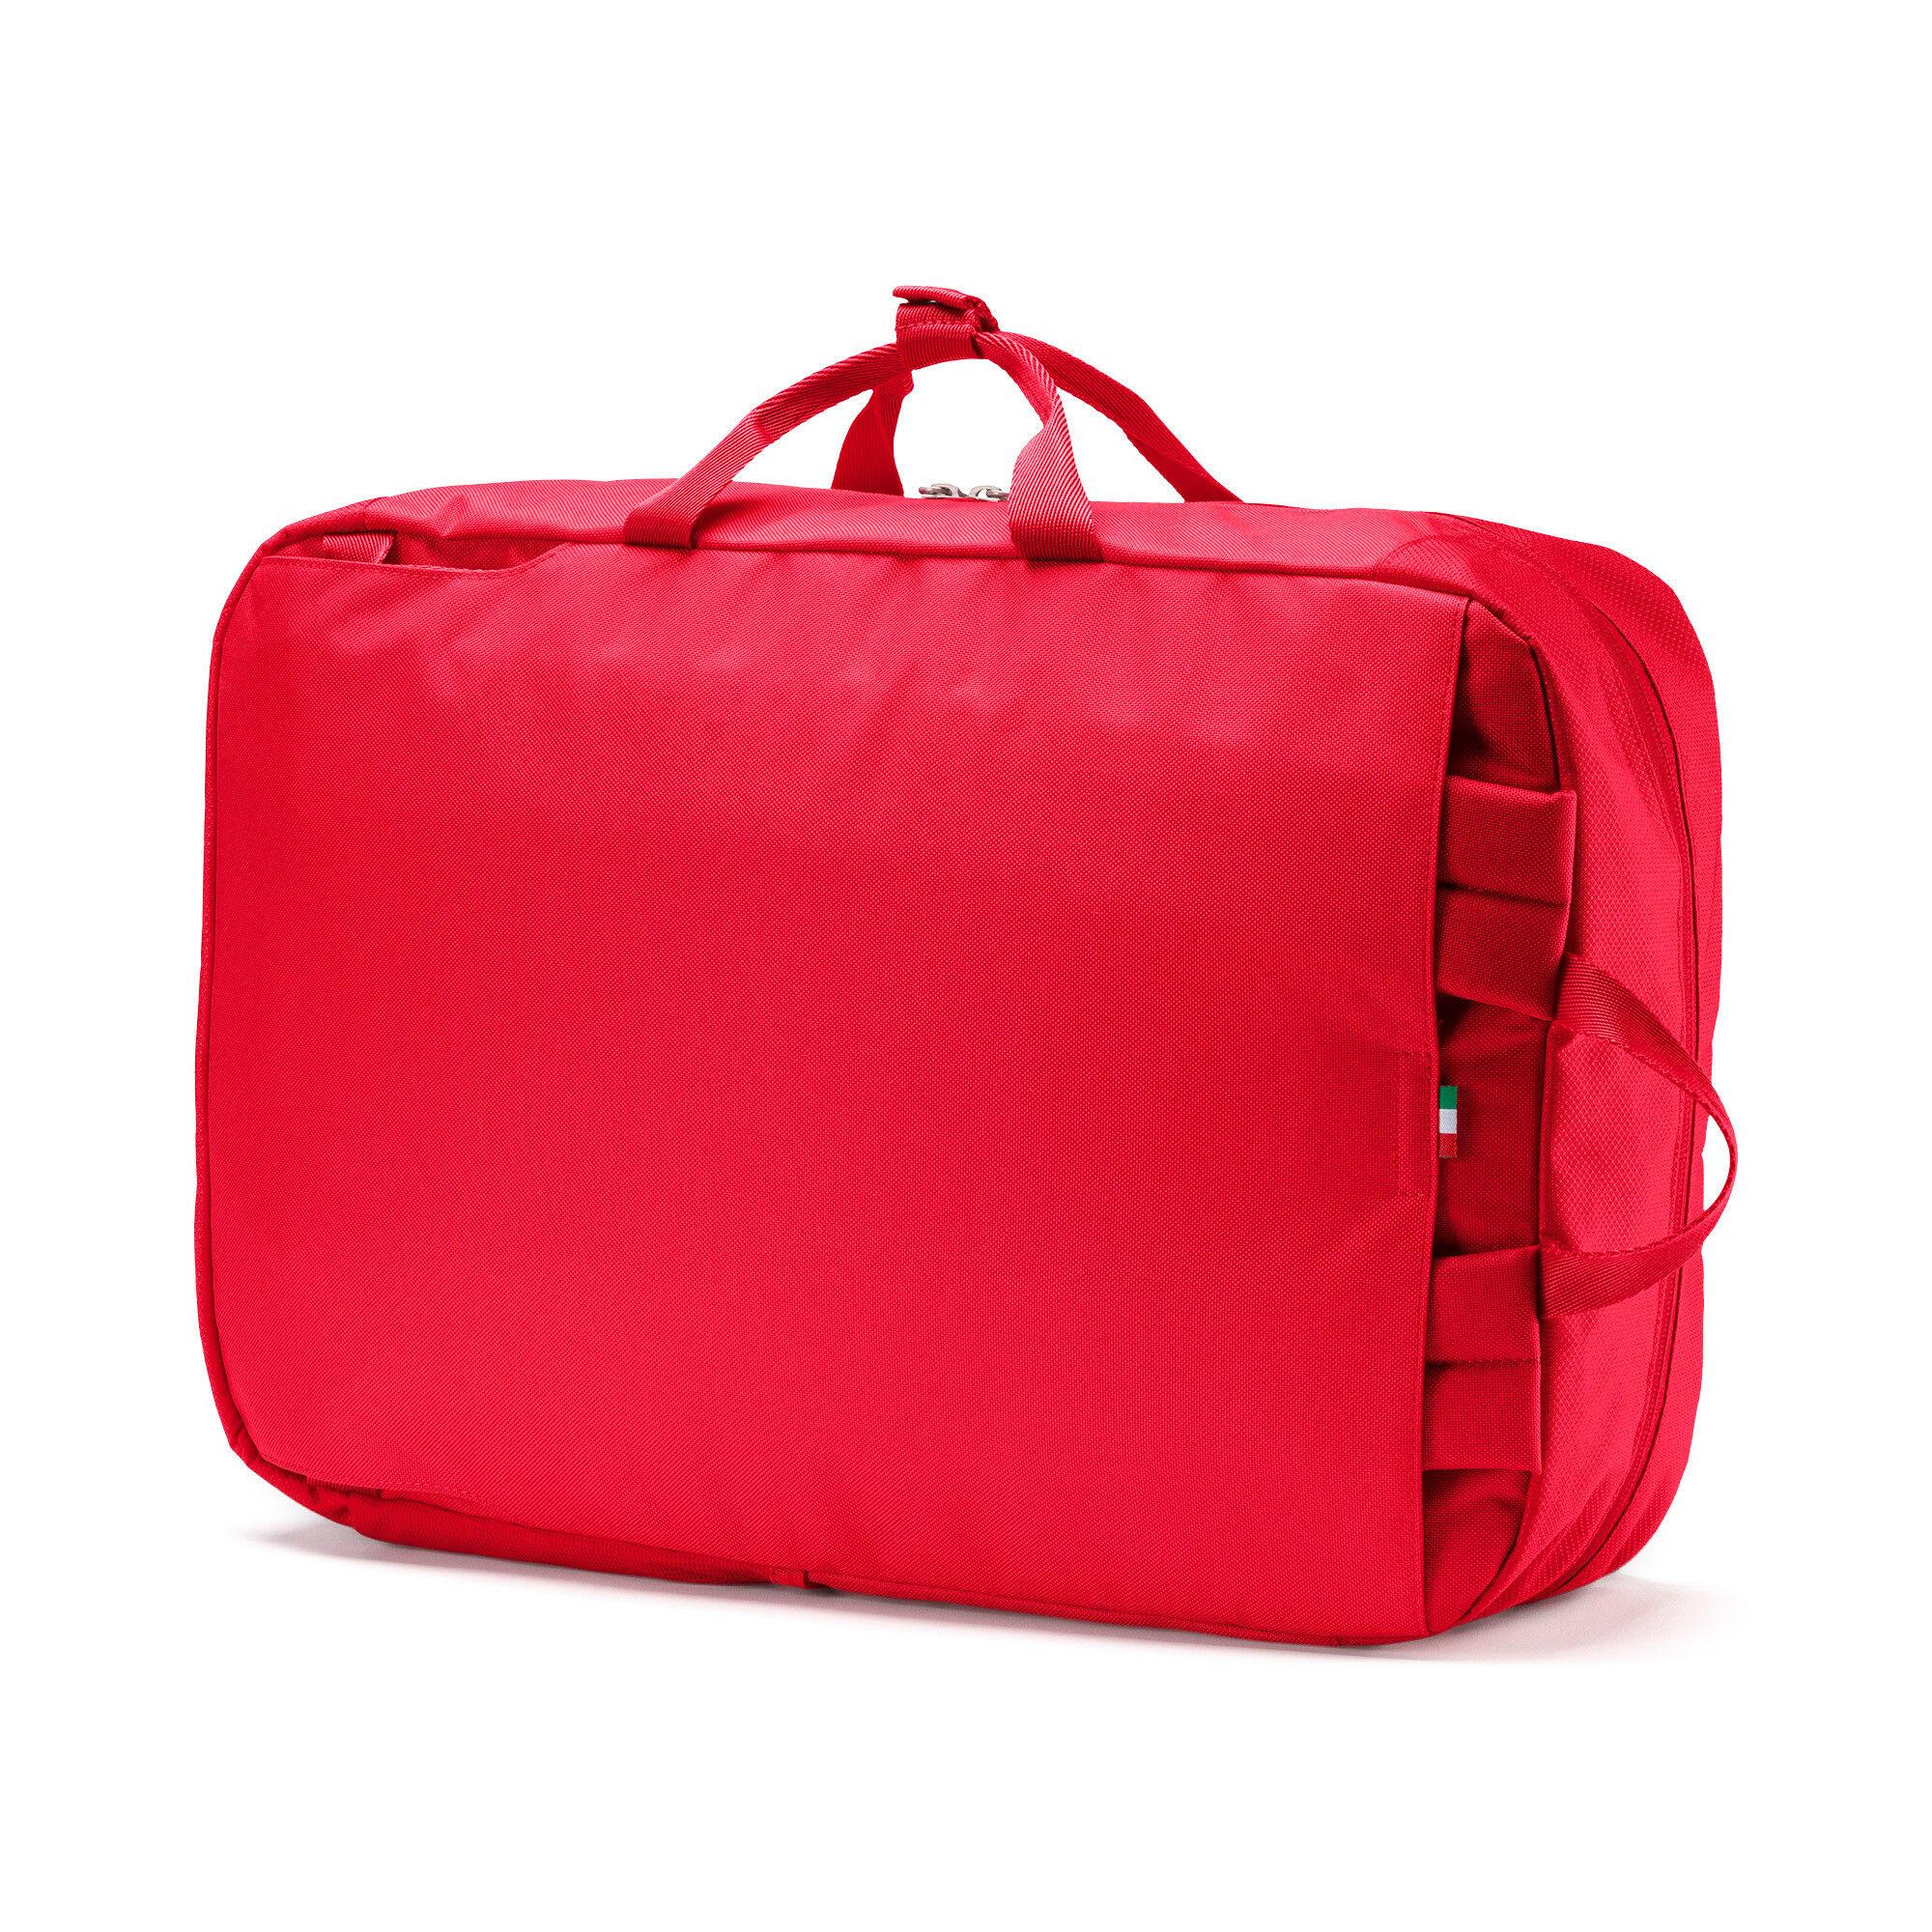 Thumbnail 4 of Ferrari Replica Backpack, Rosso Corsa, medium